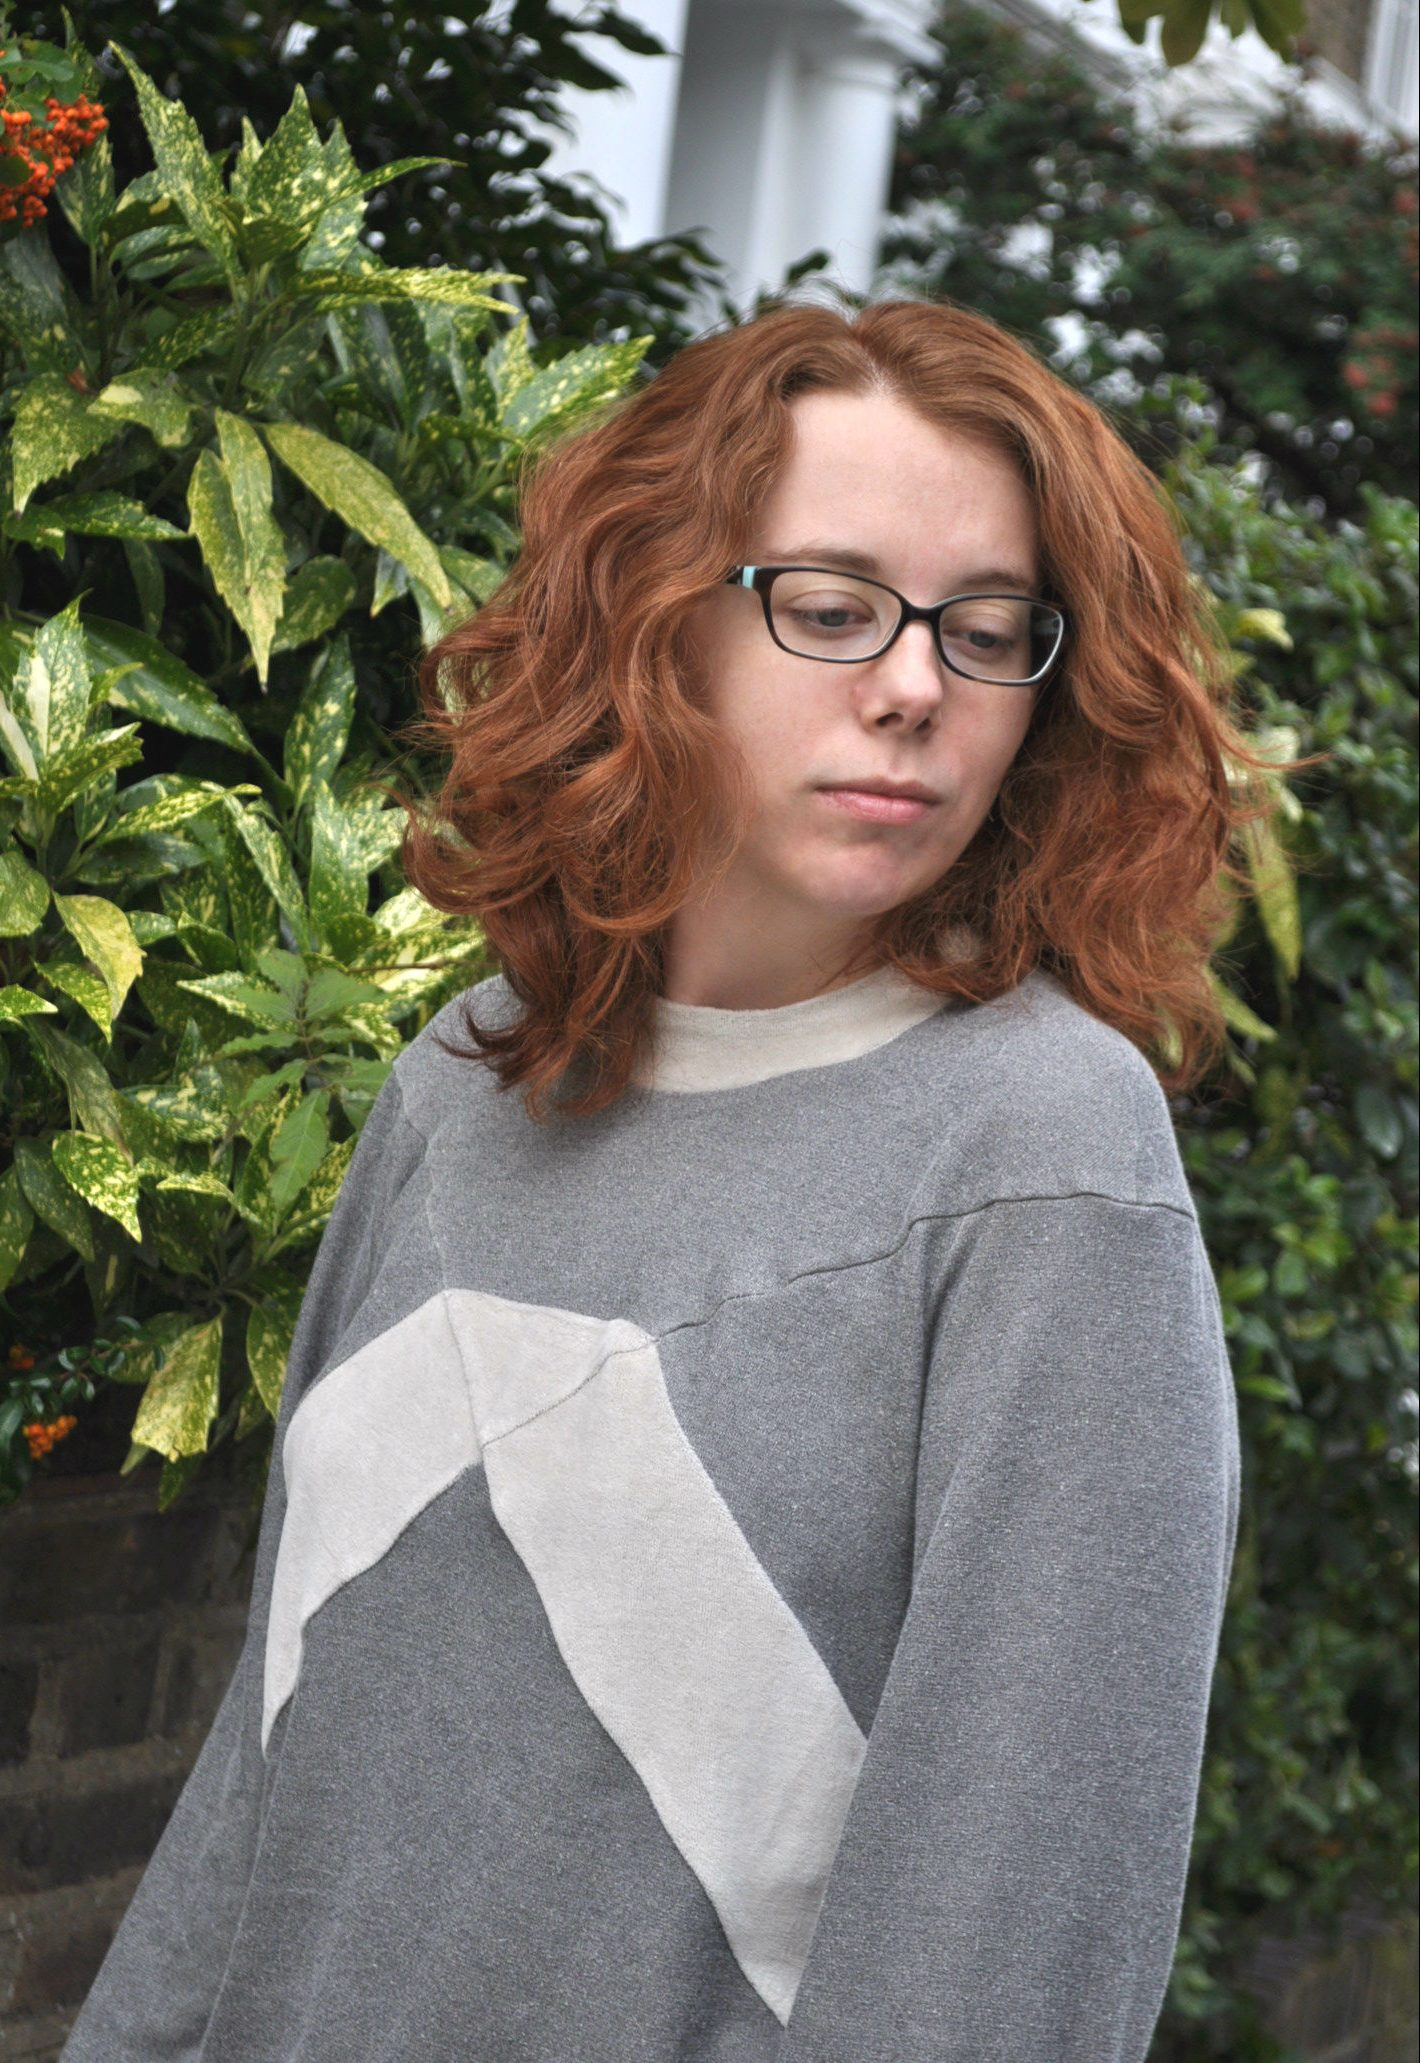 Style Maker Fabric | Gemma Sweater Up Close